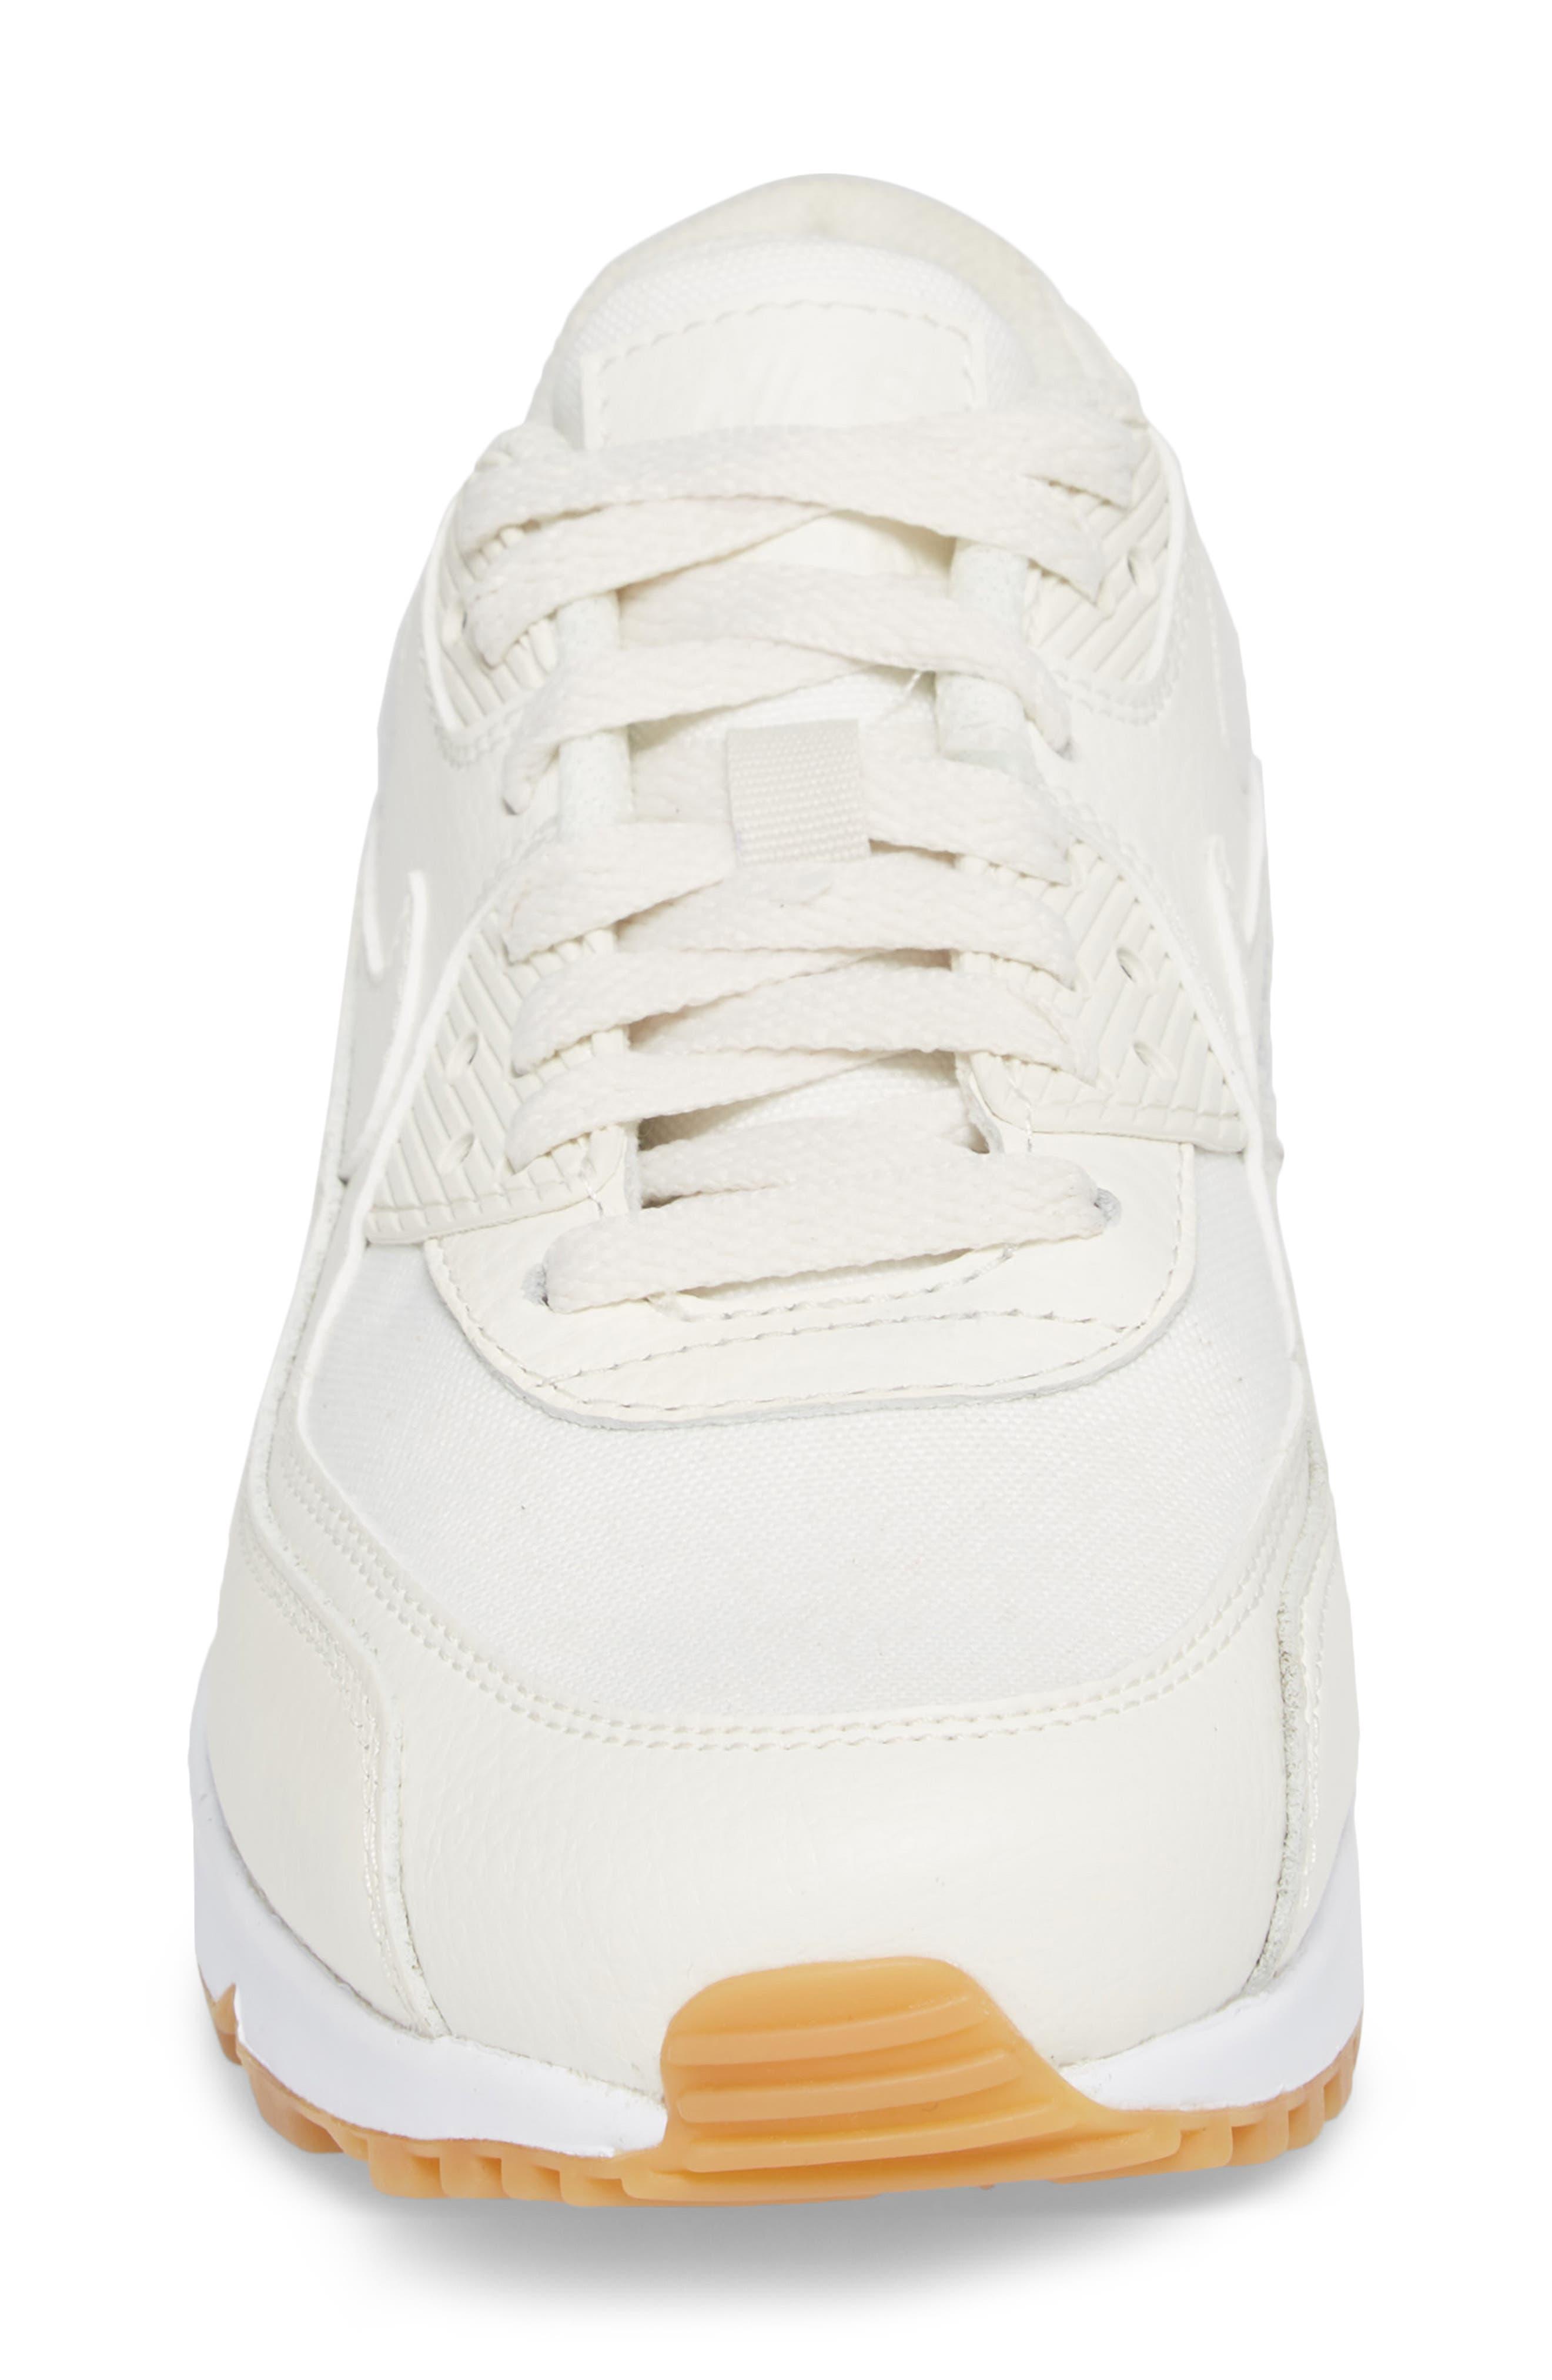 Air Max 90 Premium Sneaker,                             Alternate thumbnail 4, color,                             Sail/ Light Brown/ White